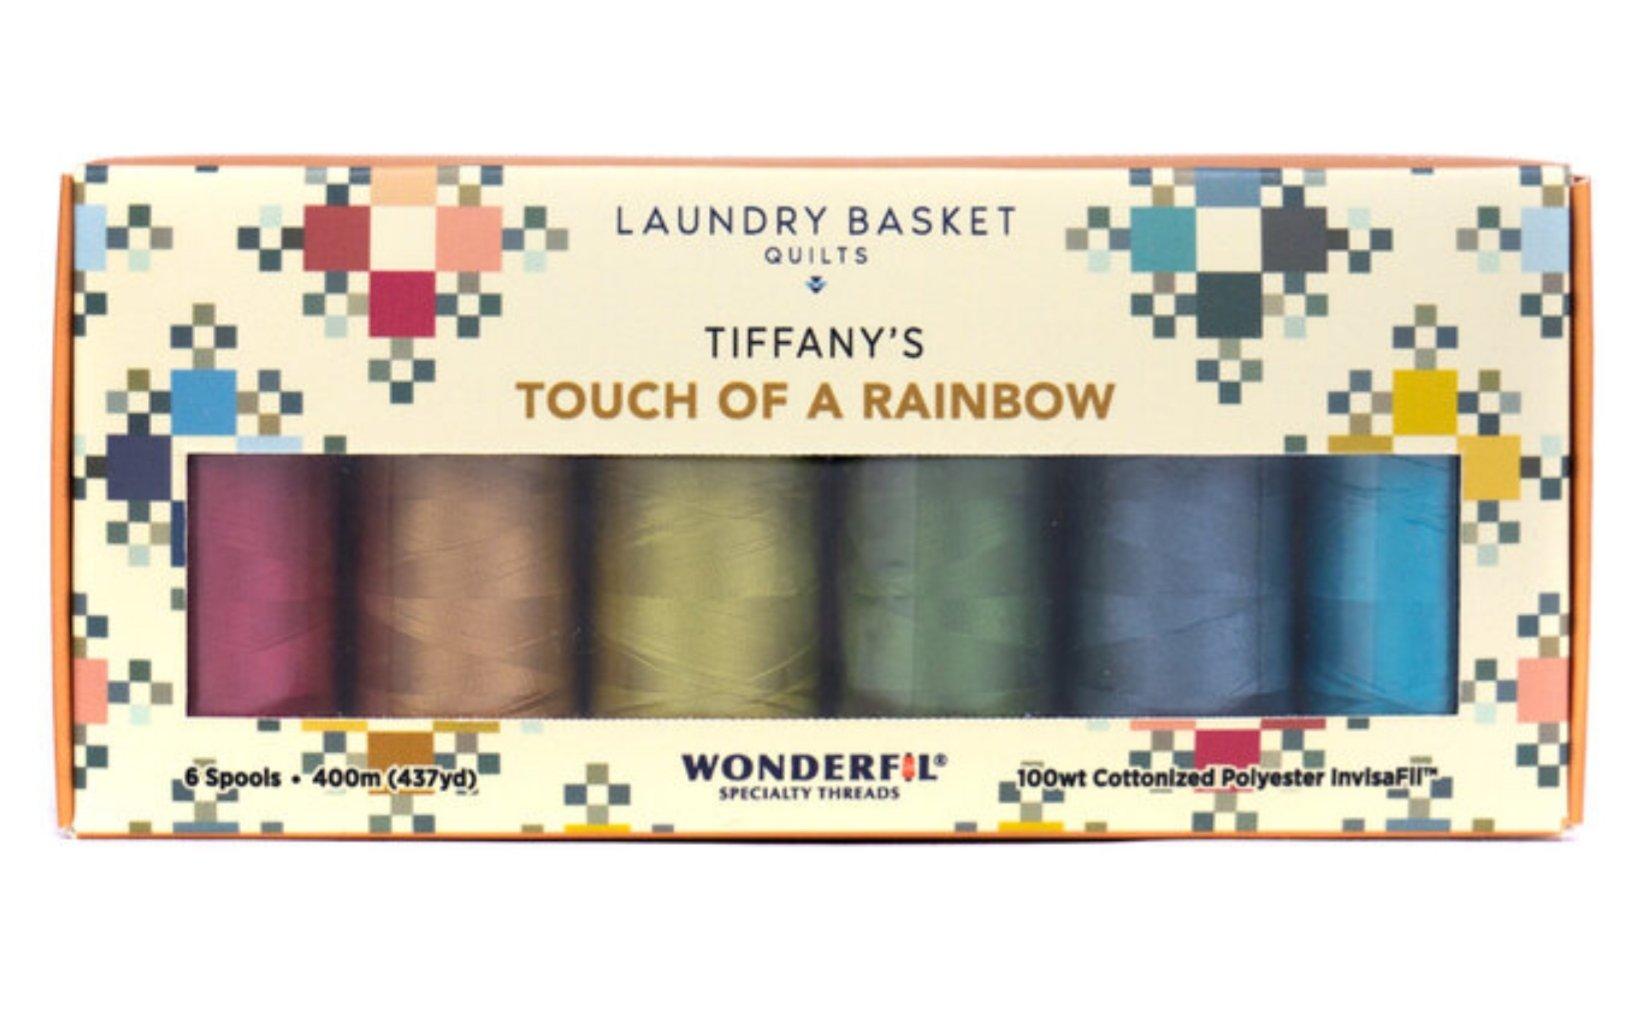 Invisafil Tiffany's Touch of a Rainbow 6 Spools